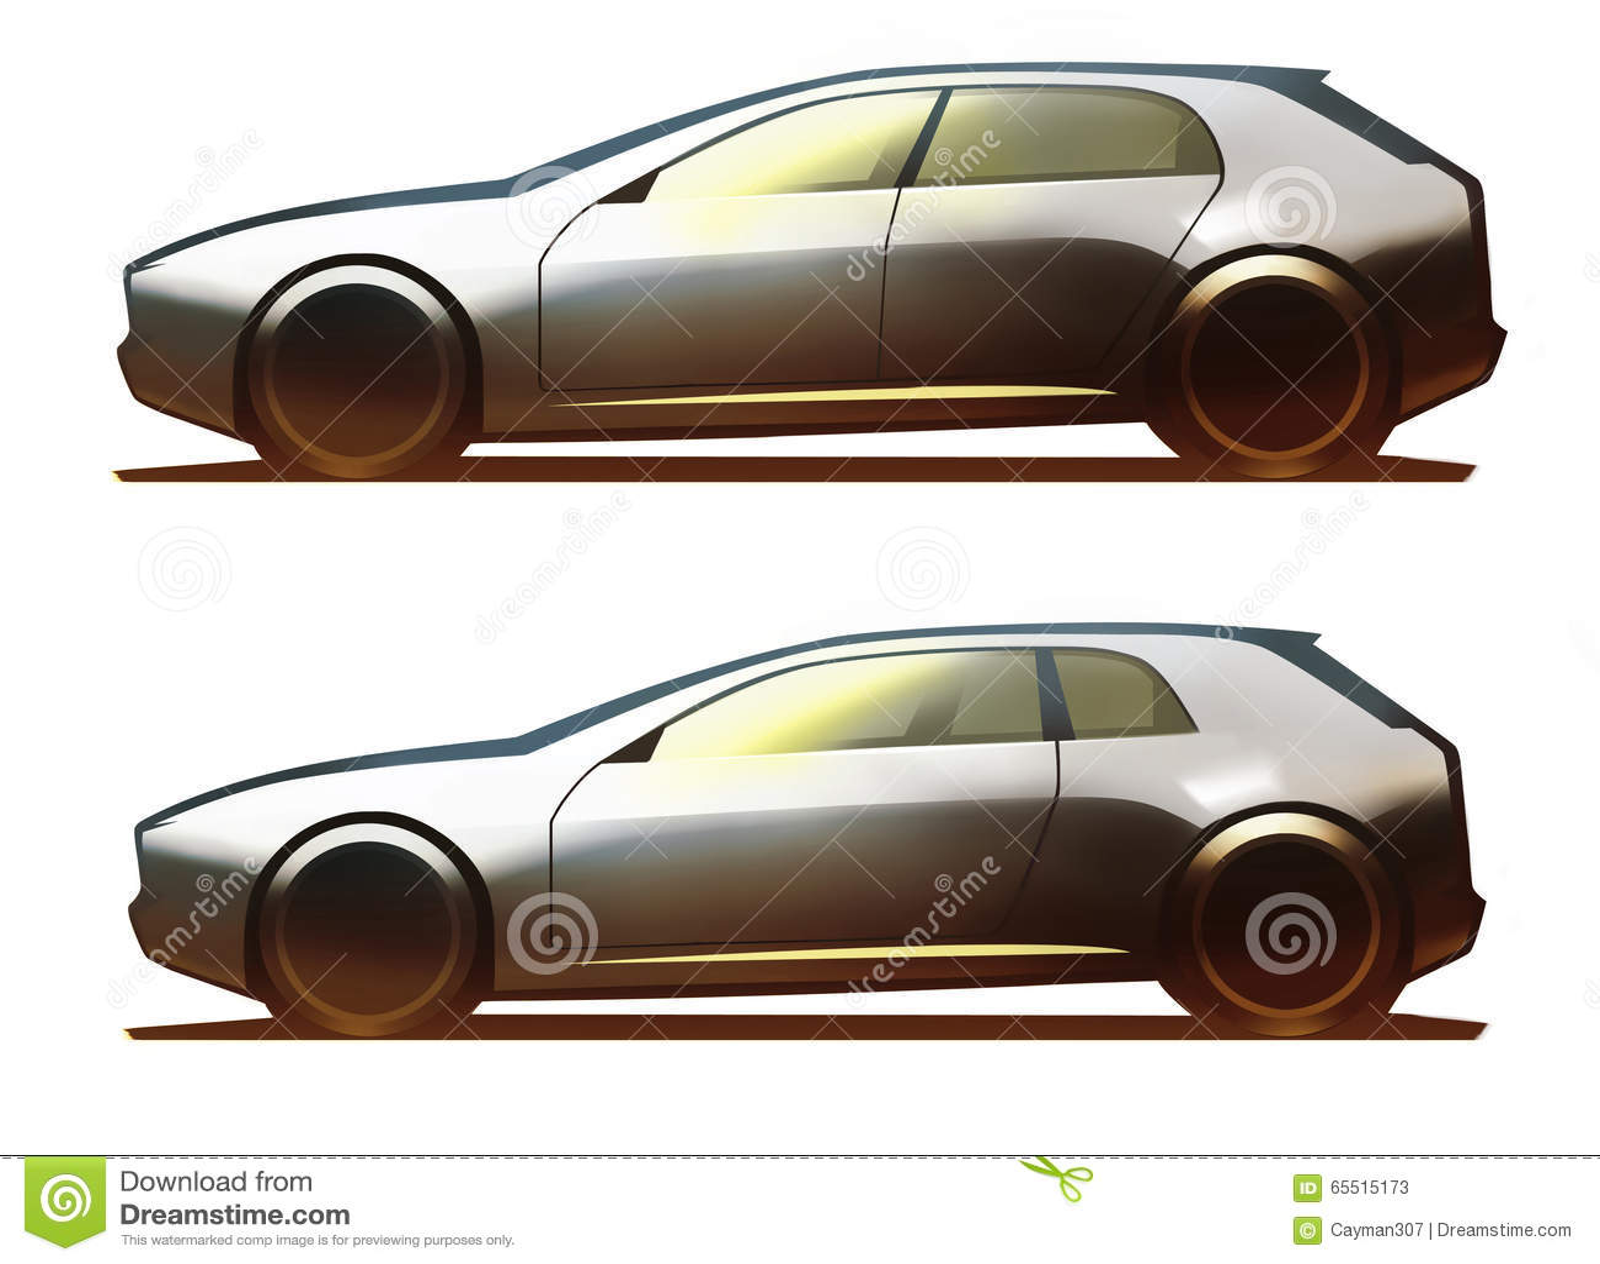 berline avec hayon arri re de la carrosserie 5 door et berline avec hayon arri re 3 door. Black Bedroom Furniture Sets. Home Design Ideas